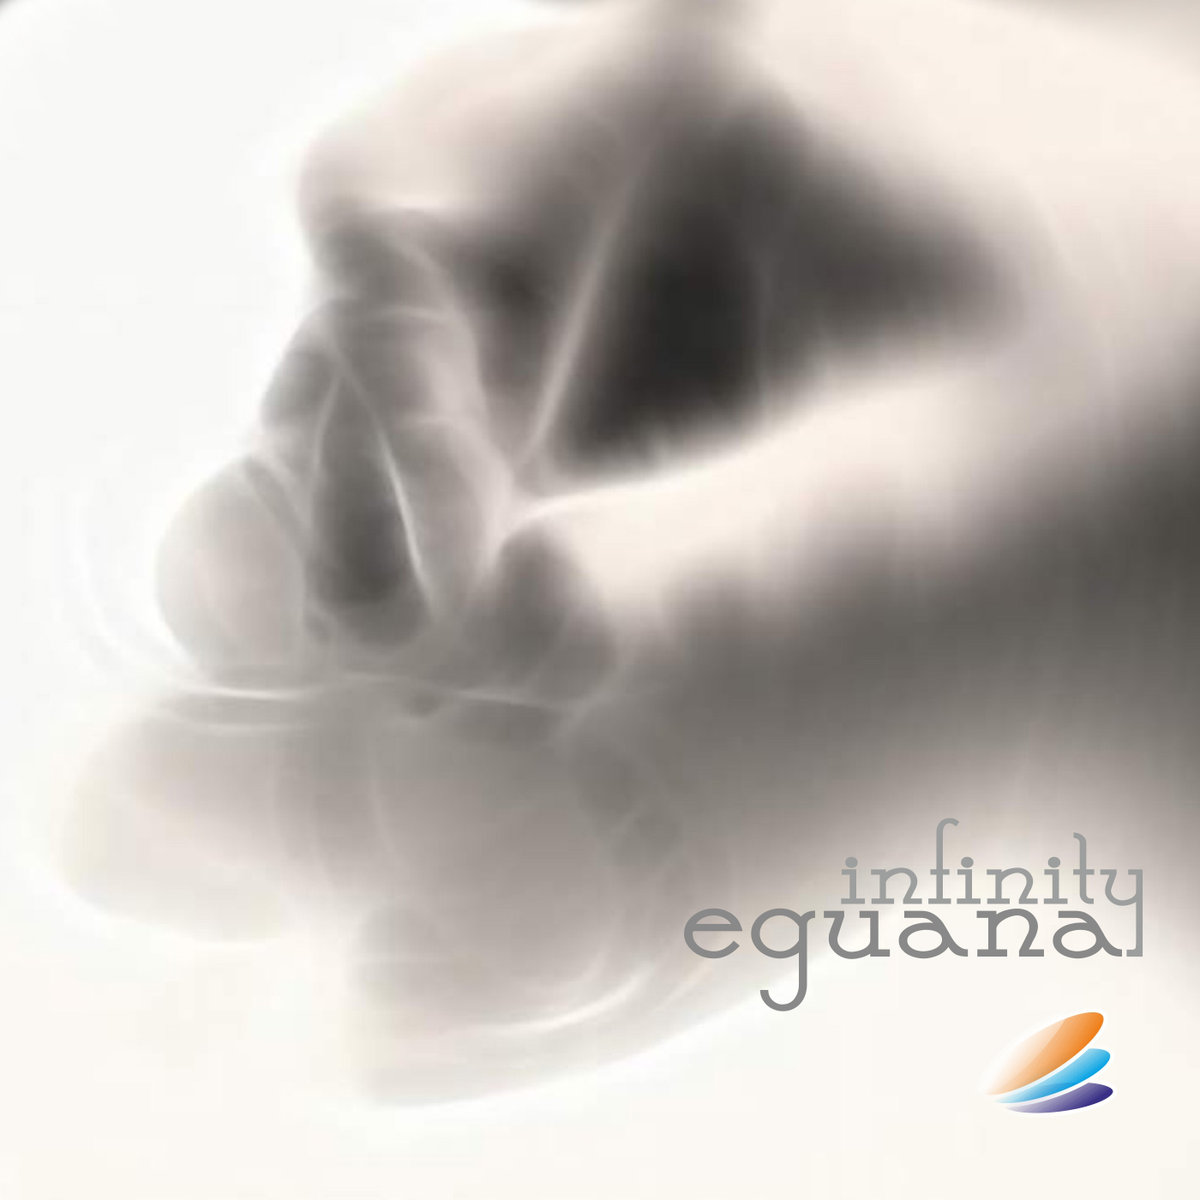 Eguana - Infinity